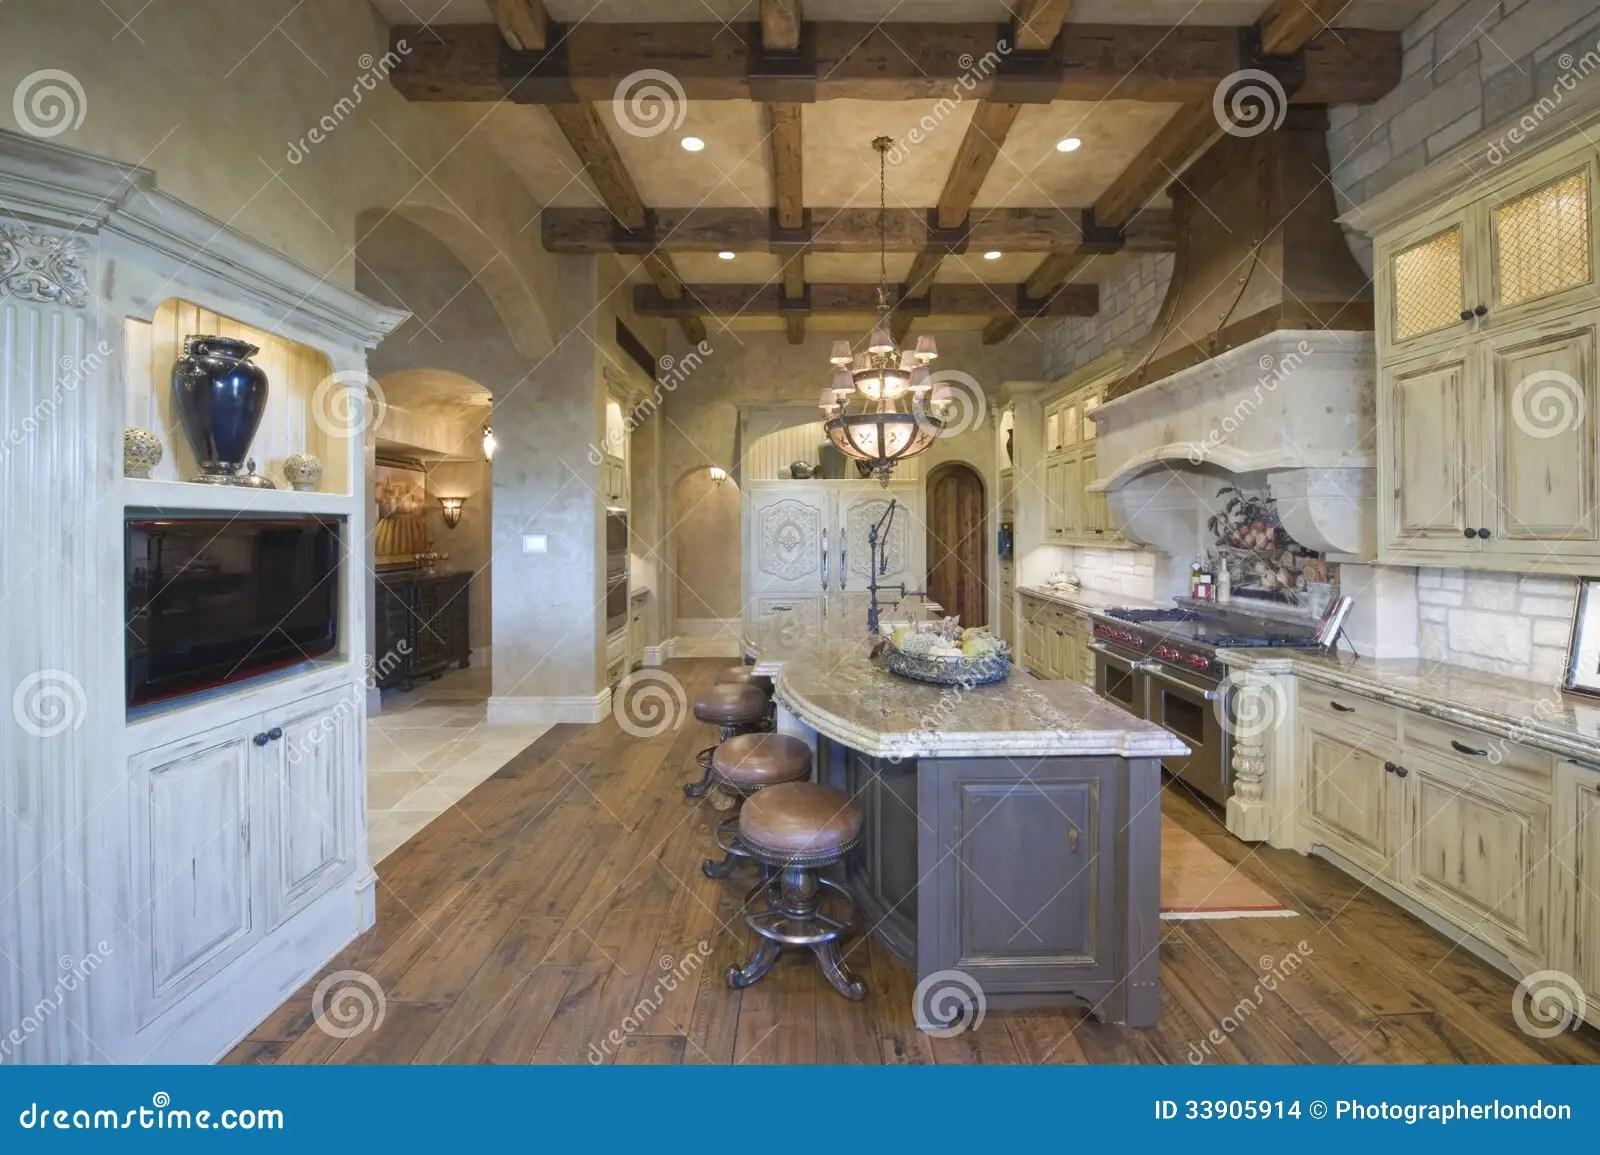 industrial kitchen stools broan exhaust fan 木头与凳子的放光的天花板在厨房库存照片 图片包括有春天 户内 家具 凳子看法在海岛的有枝形吊灯和木头的在厨房里放光了天花板